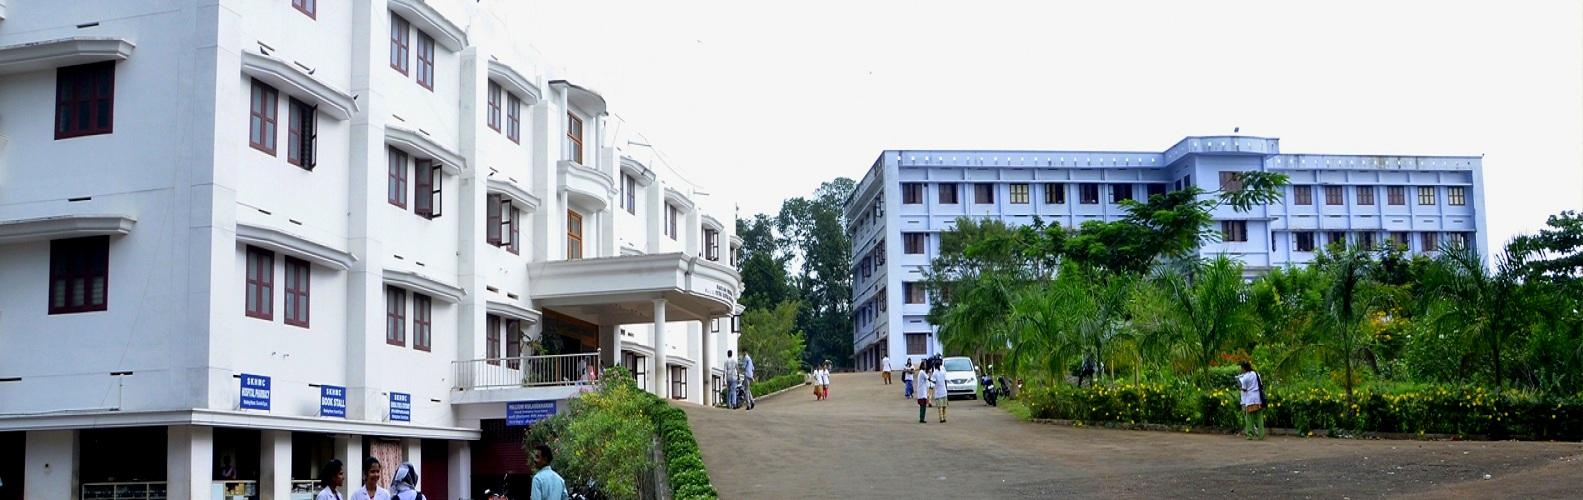 Sarada Krishna Homoeopathic Medical College, Kanyakumari Image